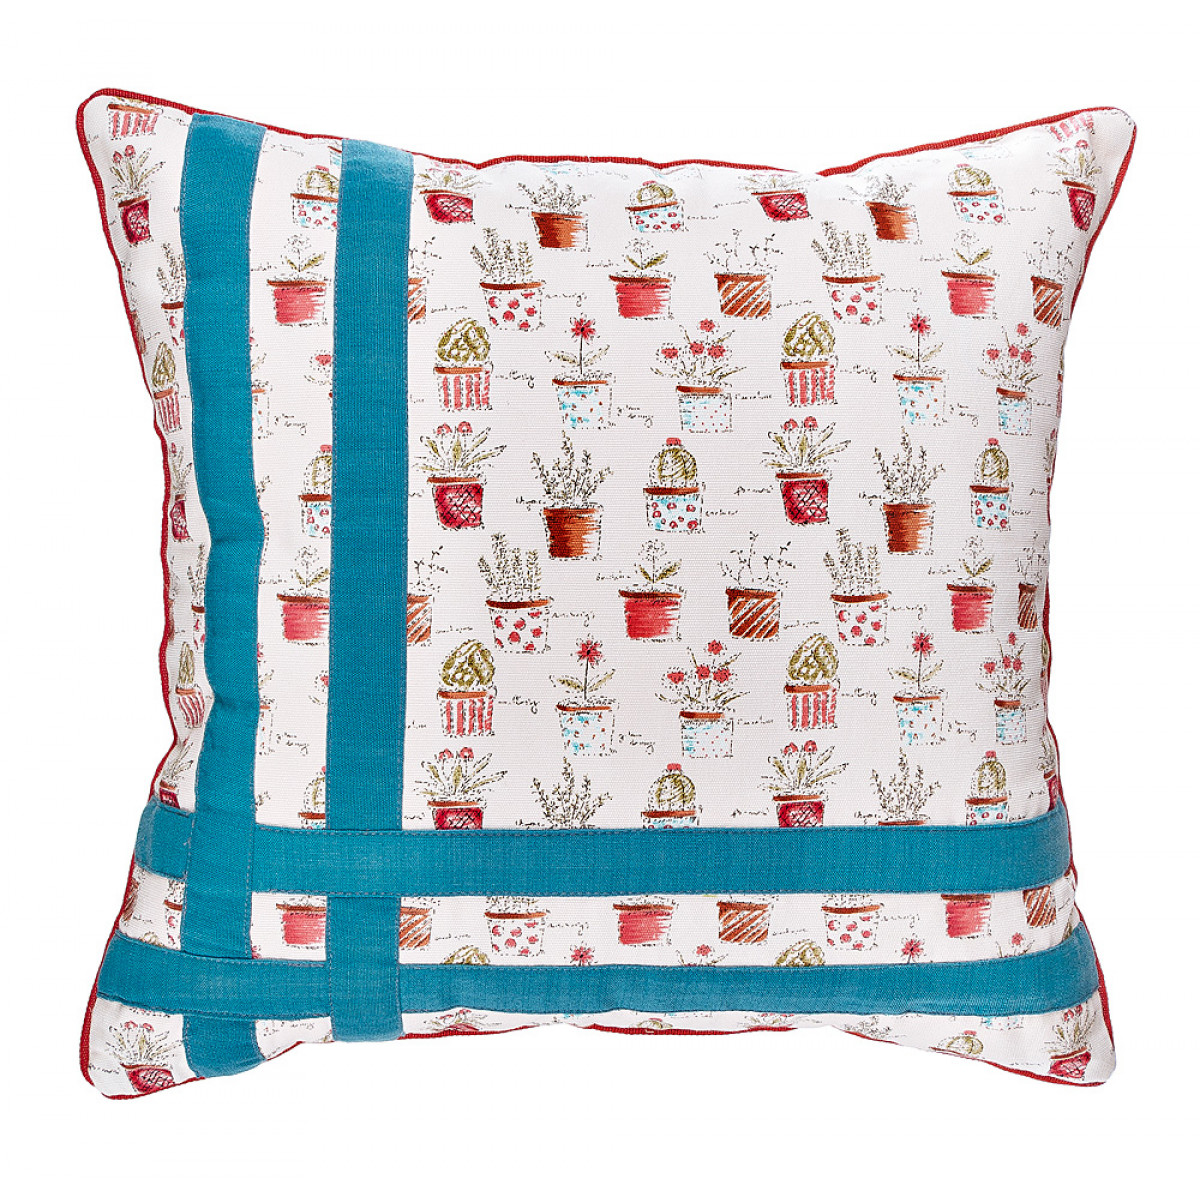 Декоративные подушки Santalino Декоративная подушка Algernon (46х46) подушка декоративная santalino райский сад 850 818 6